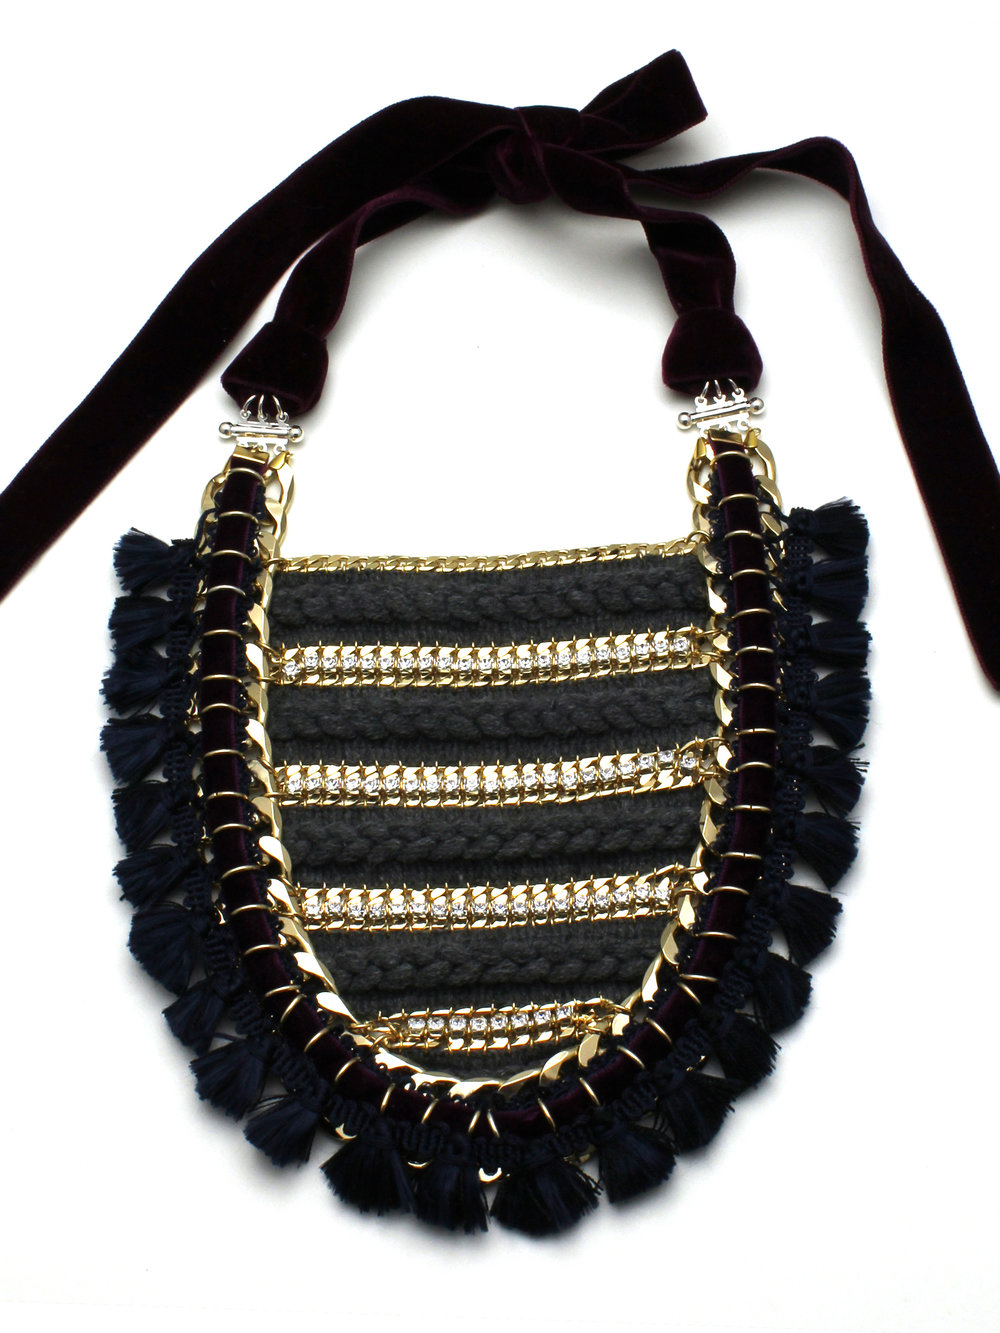 043 - Wool & Crystal Bib Necklace.jpg